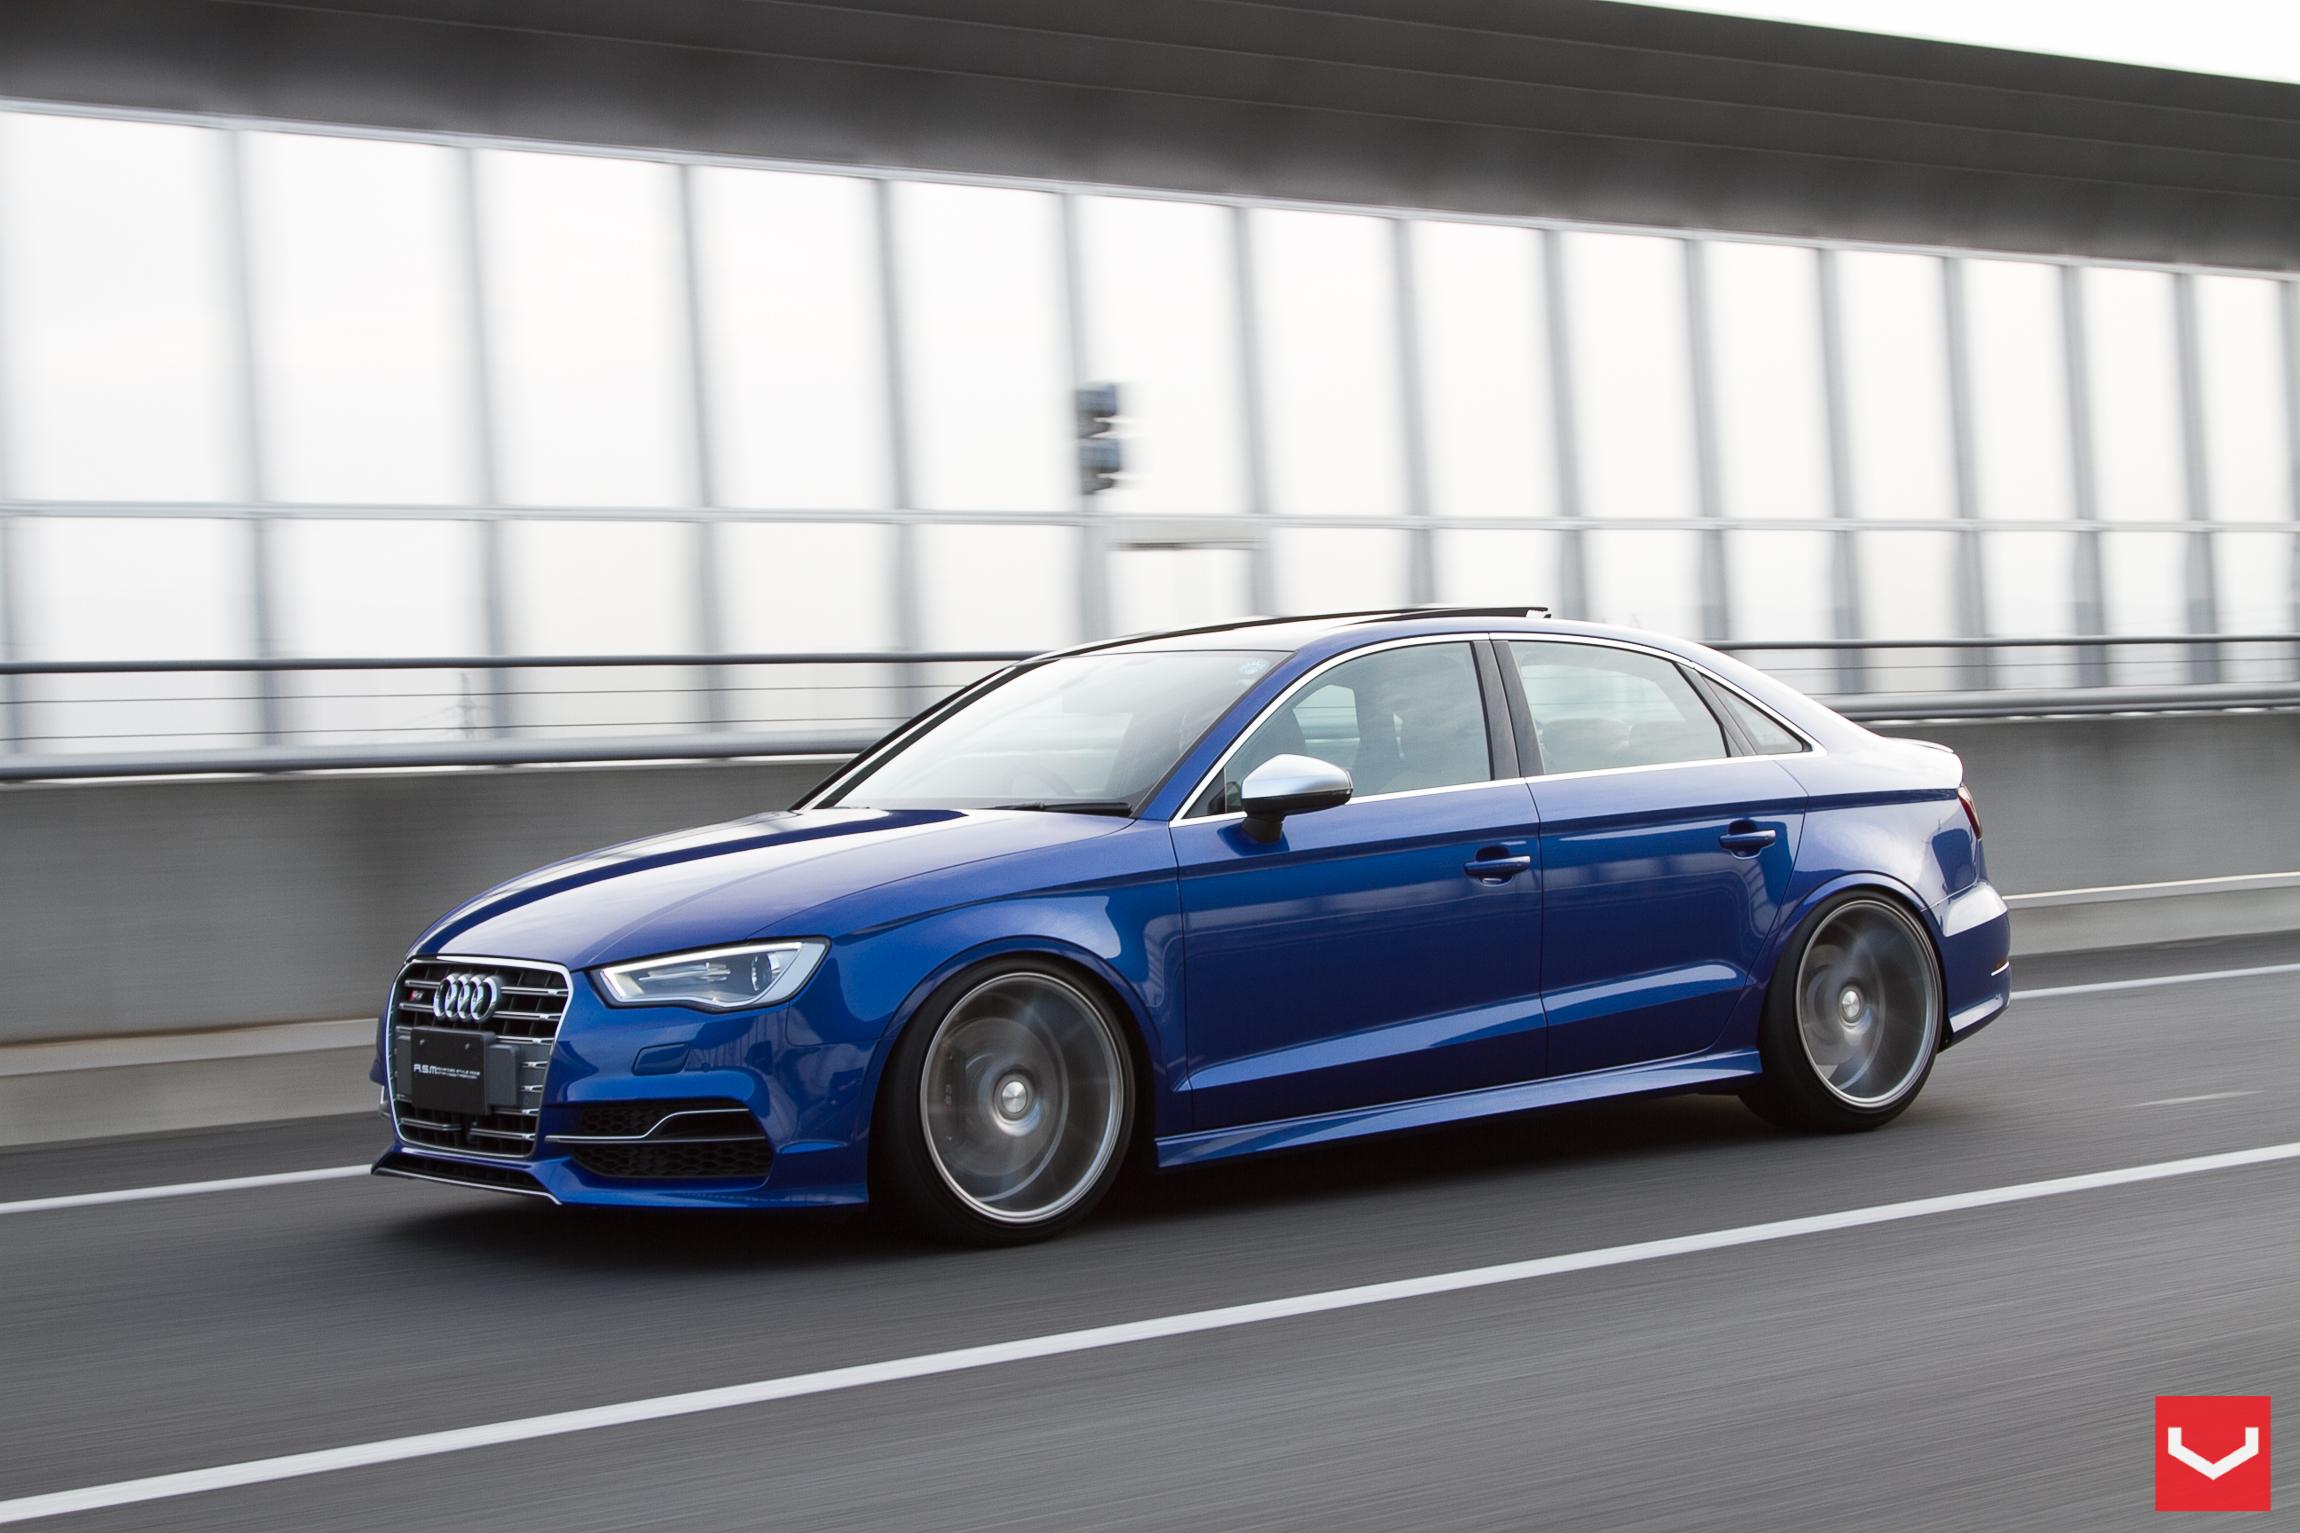 Audi A3 Vs A4 >> 2015 Audi S3 Sedan Stanced on Vossen Wheels - autoevolution